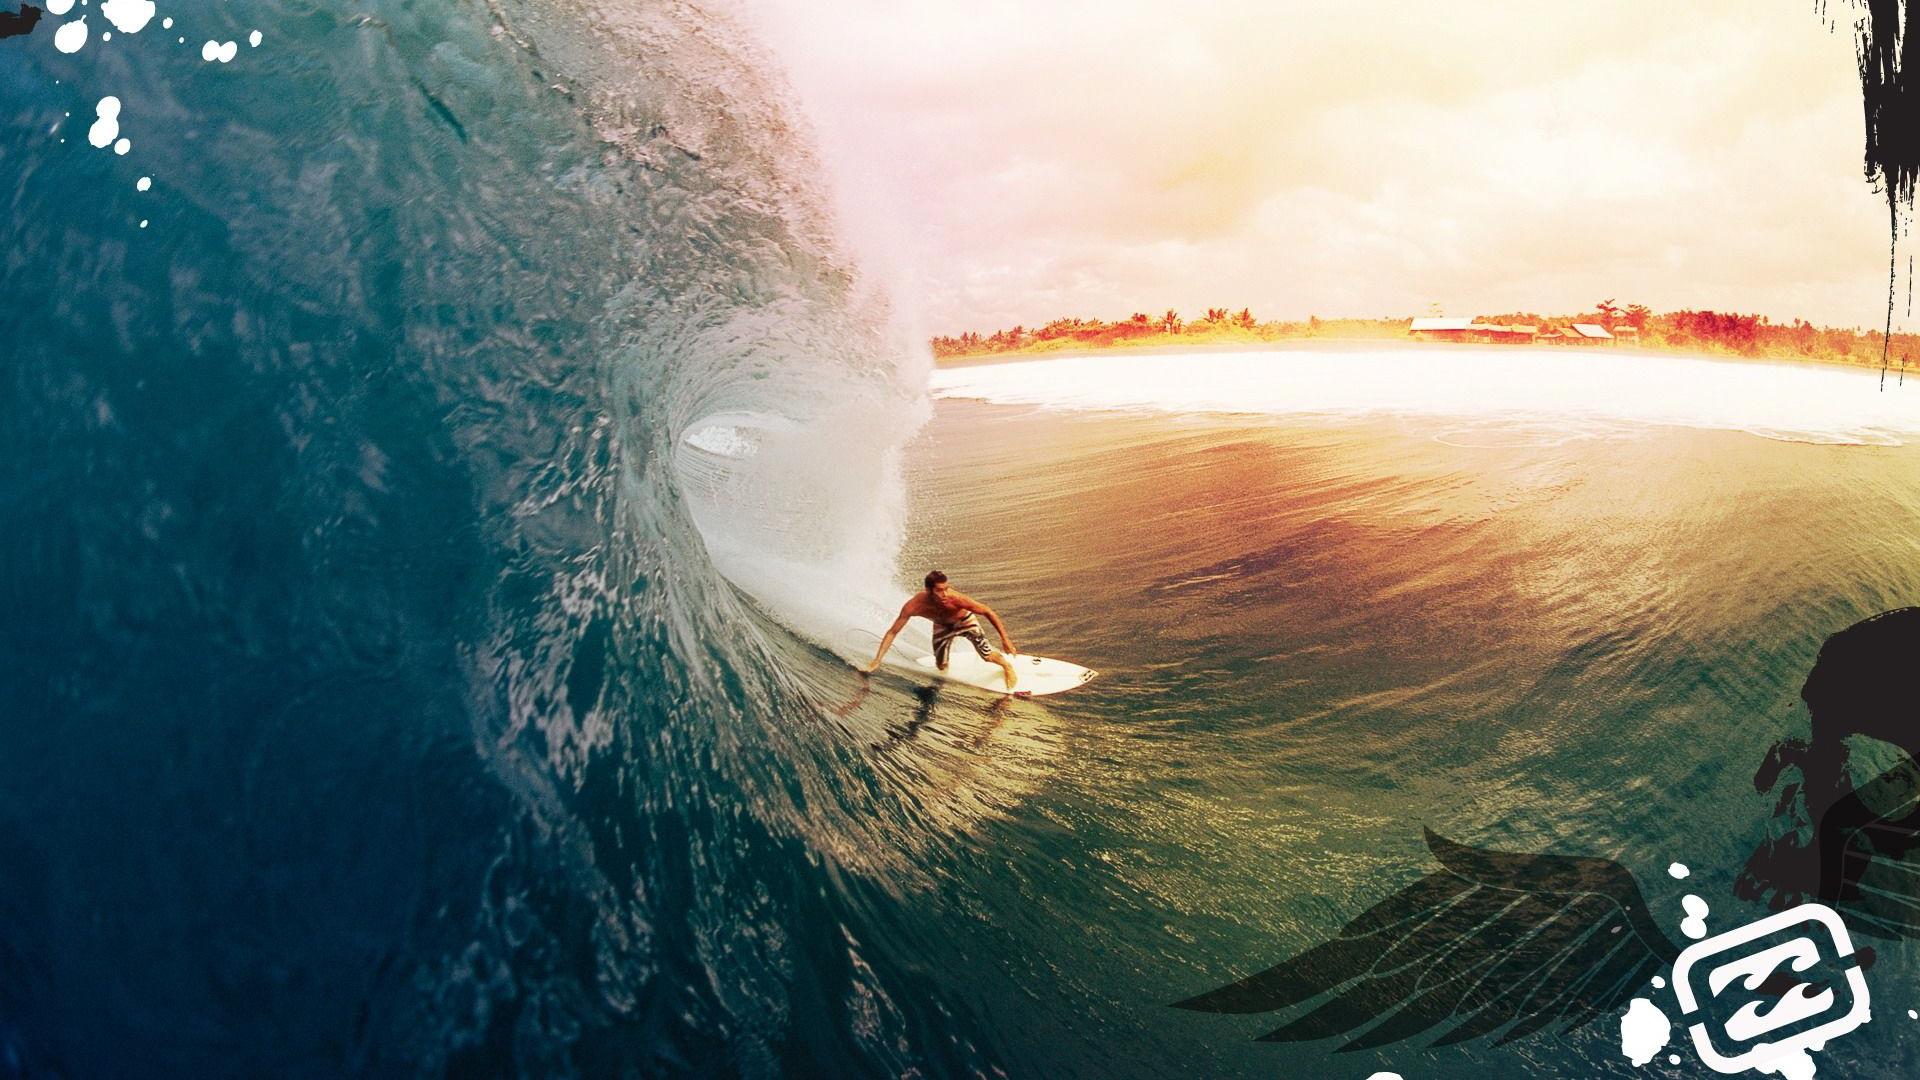 Surfer, surfing 1080p Full HD desktop background